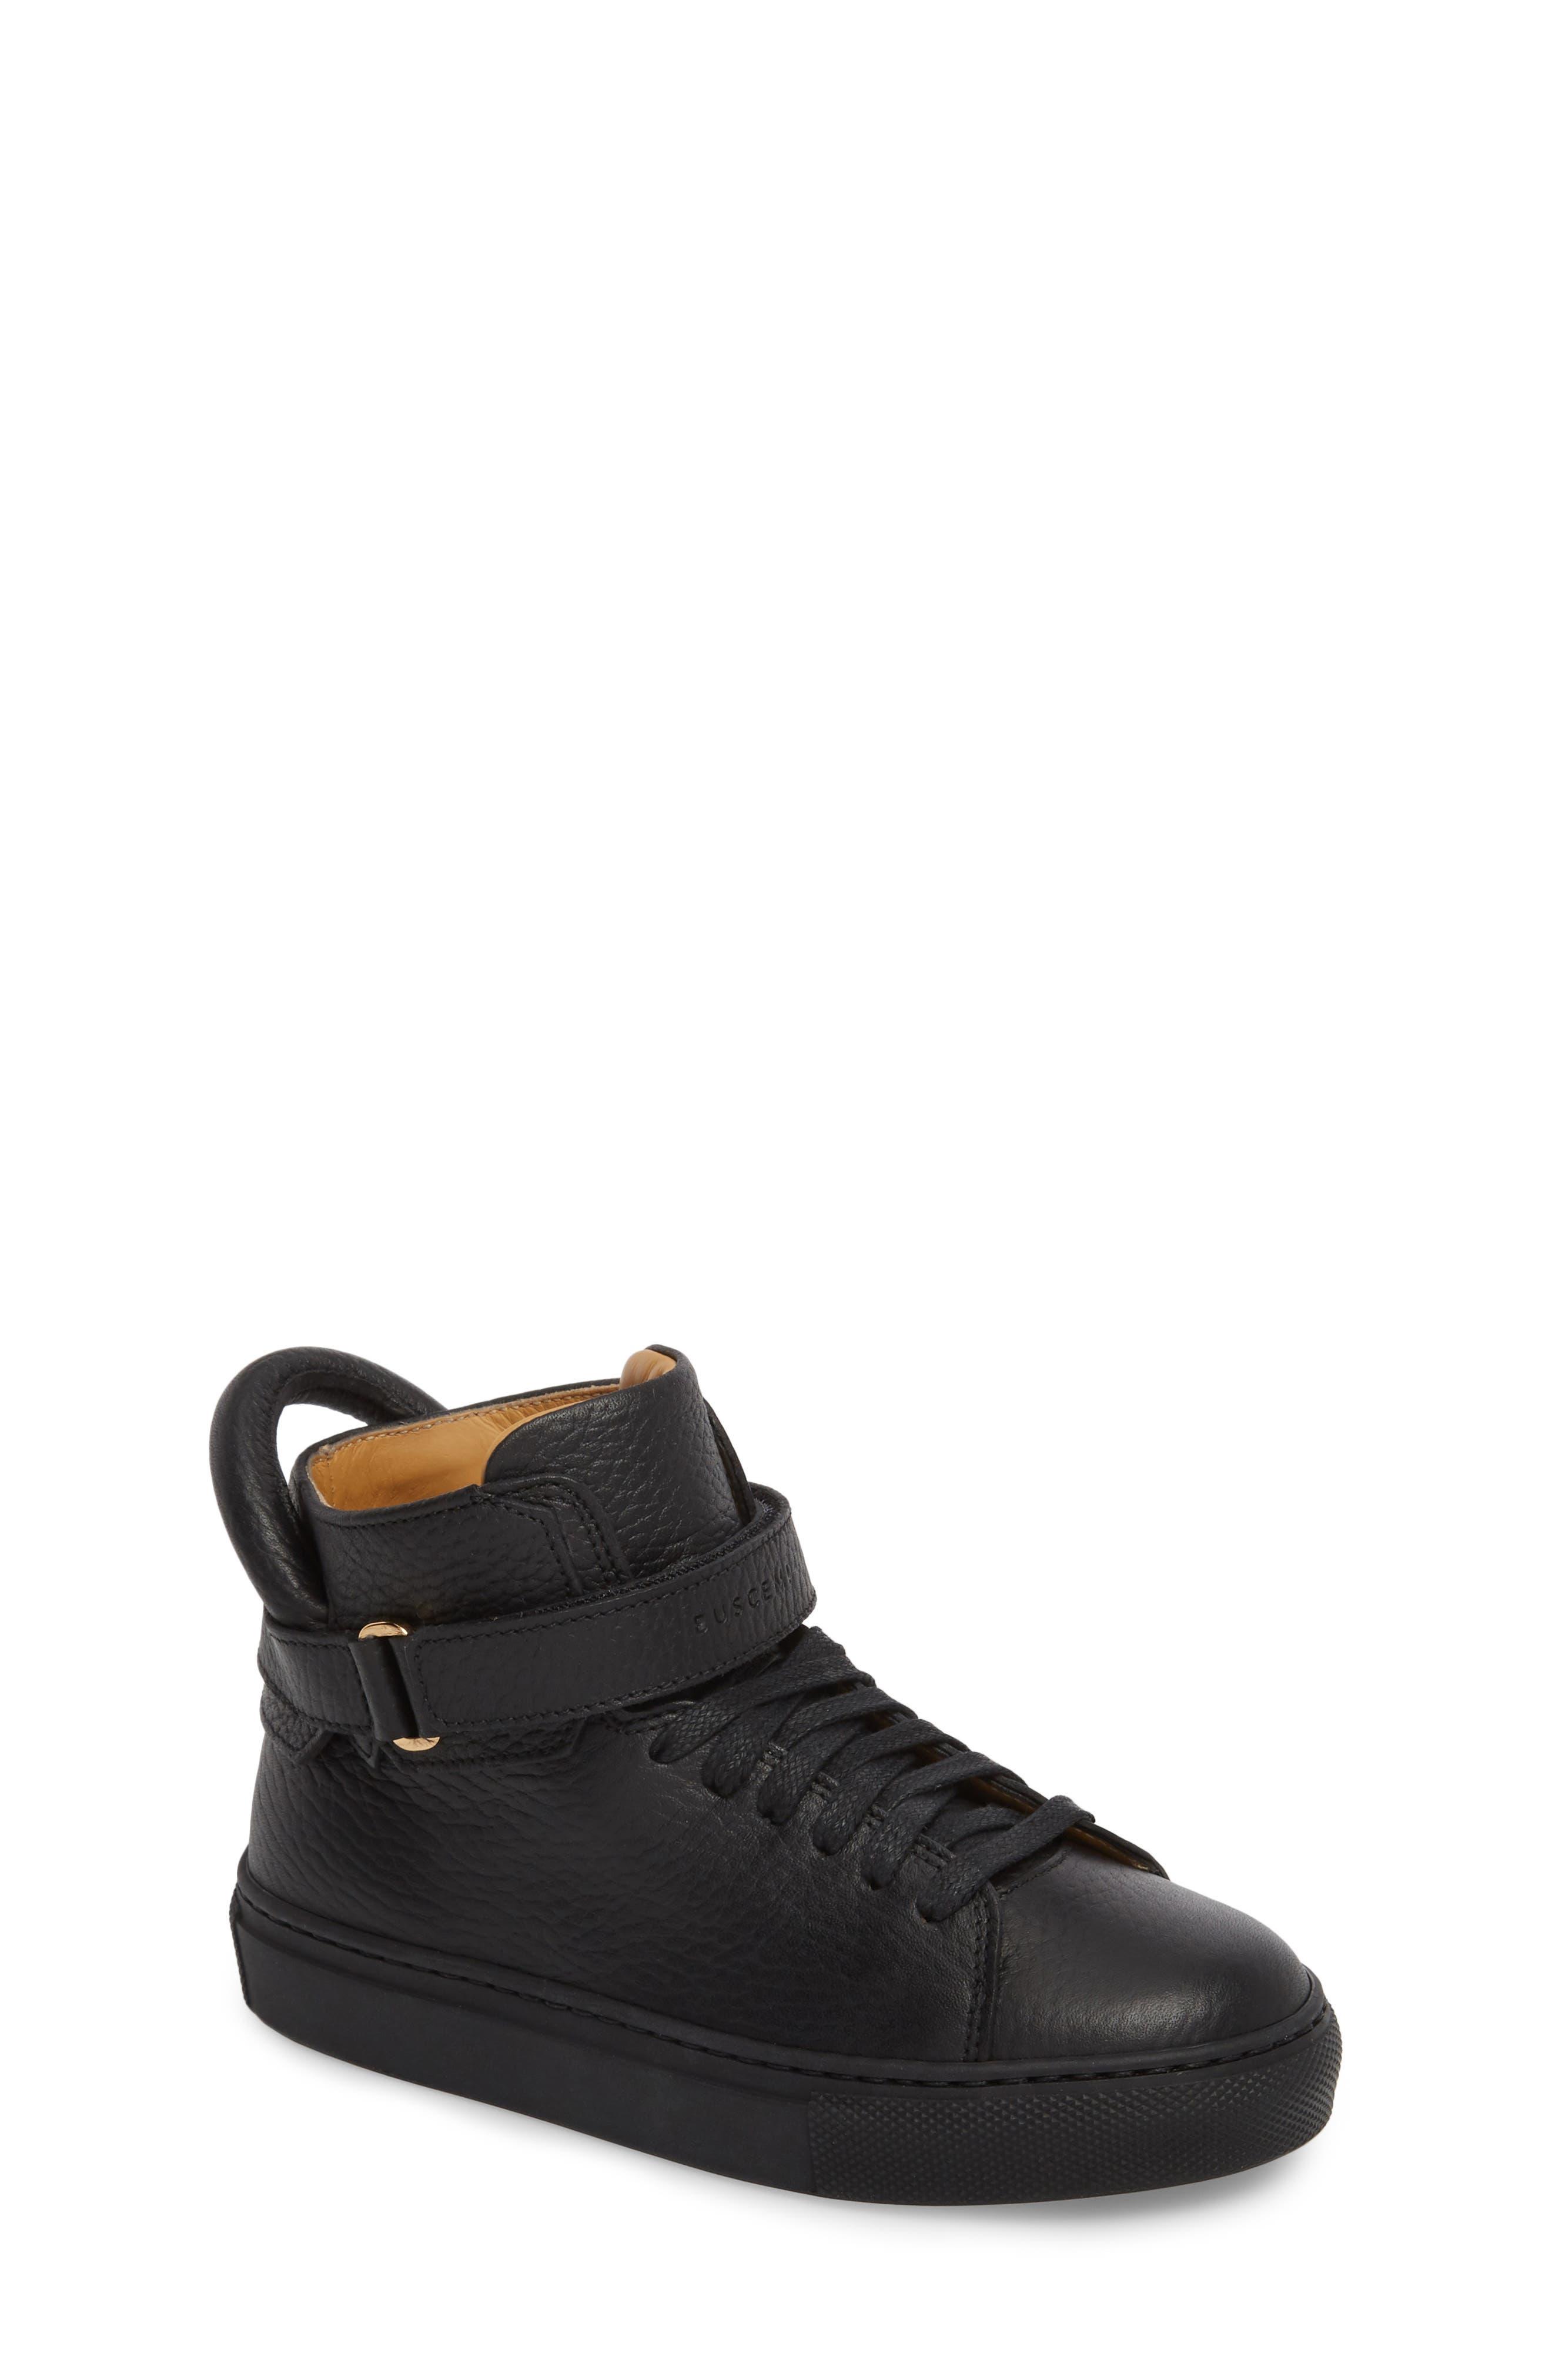 High Top Sneaker,                             Main thumbnail 1, color,                             BLACK